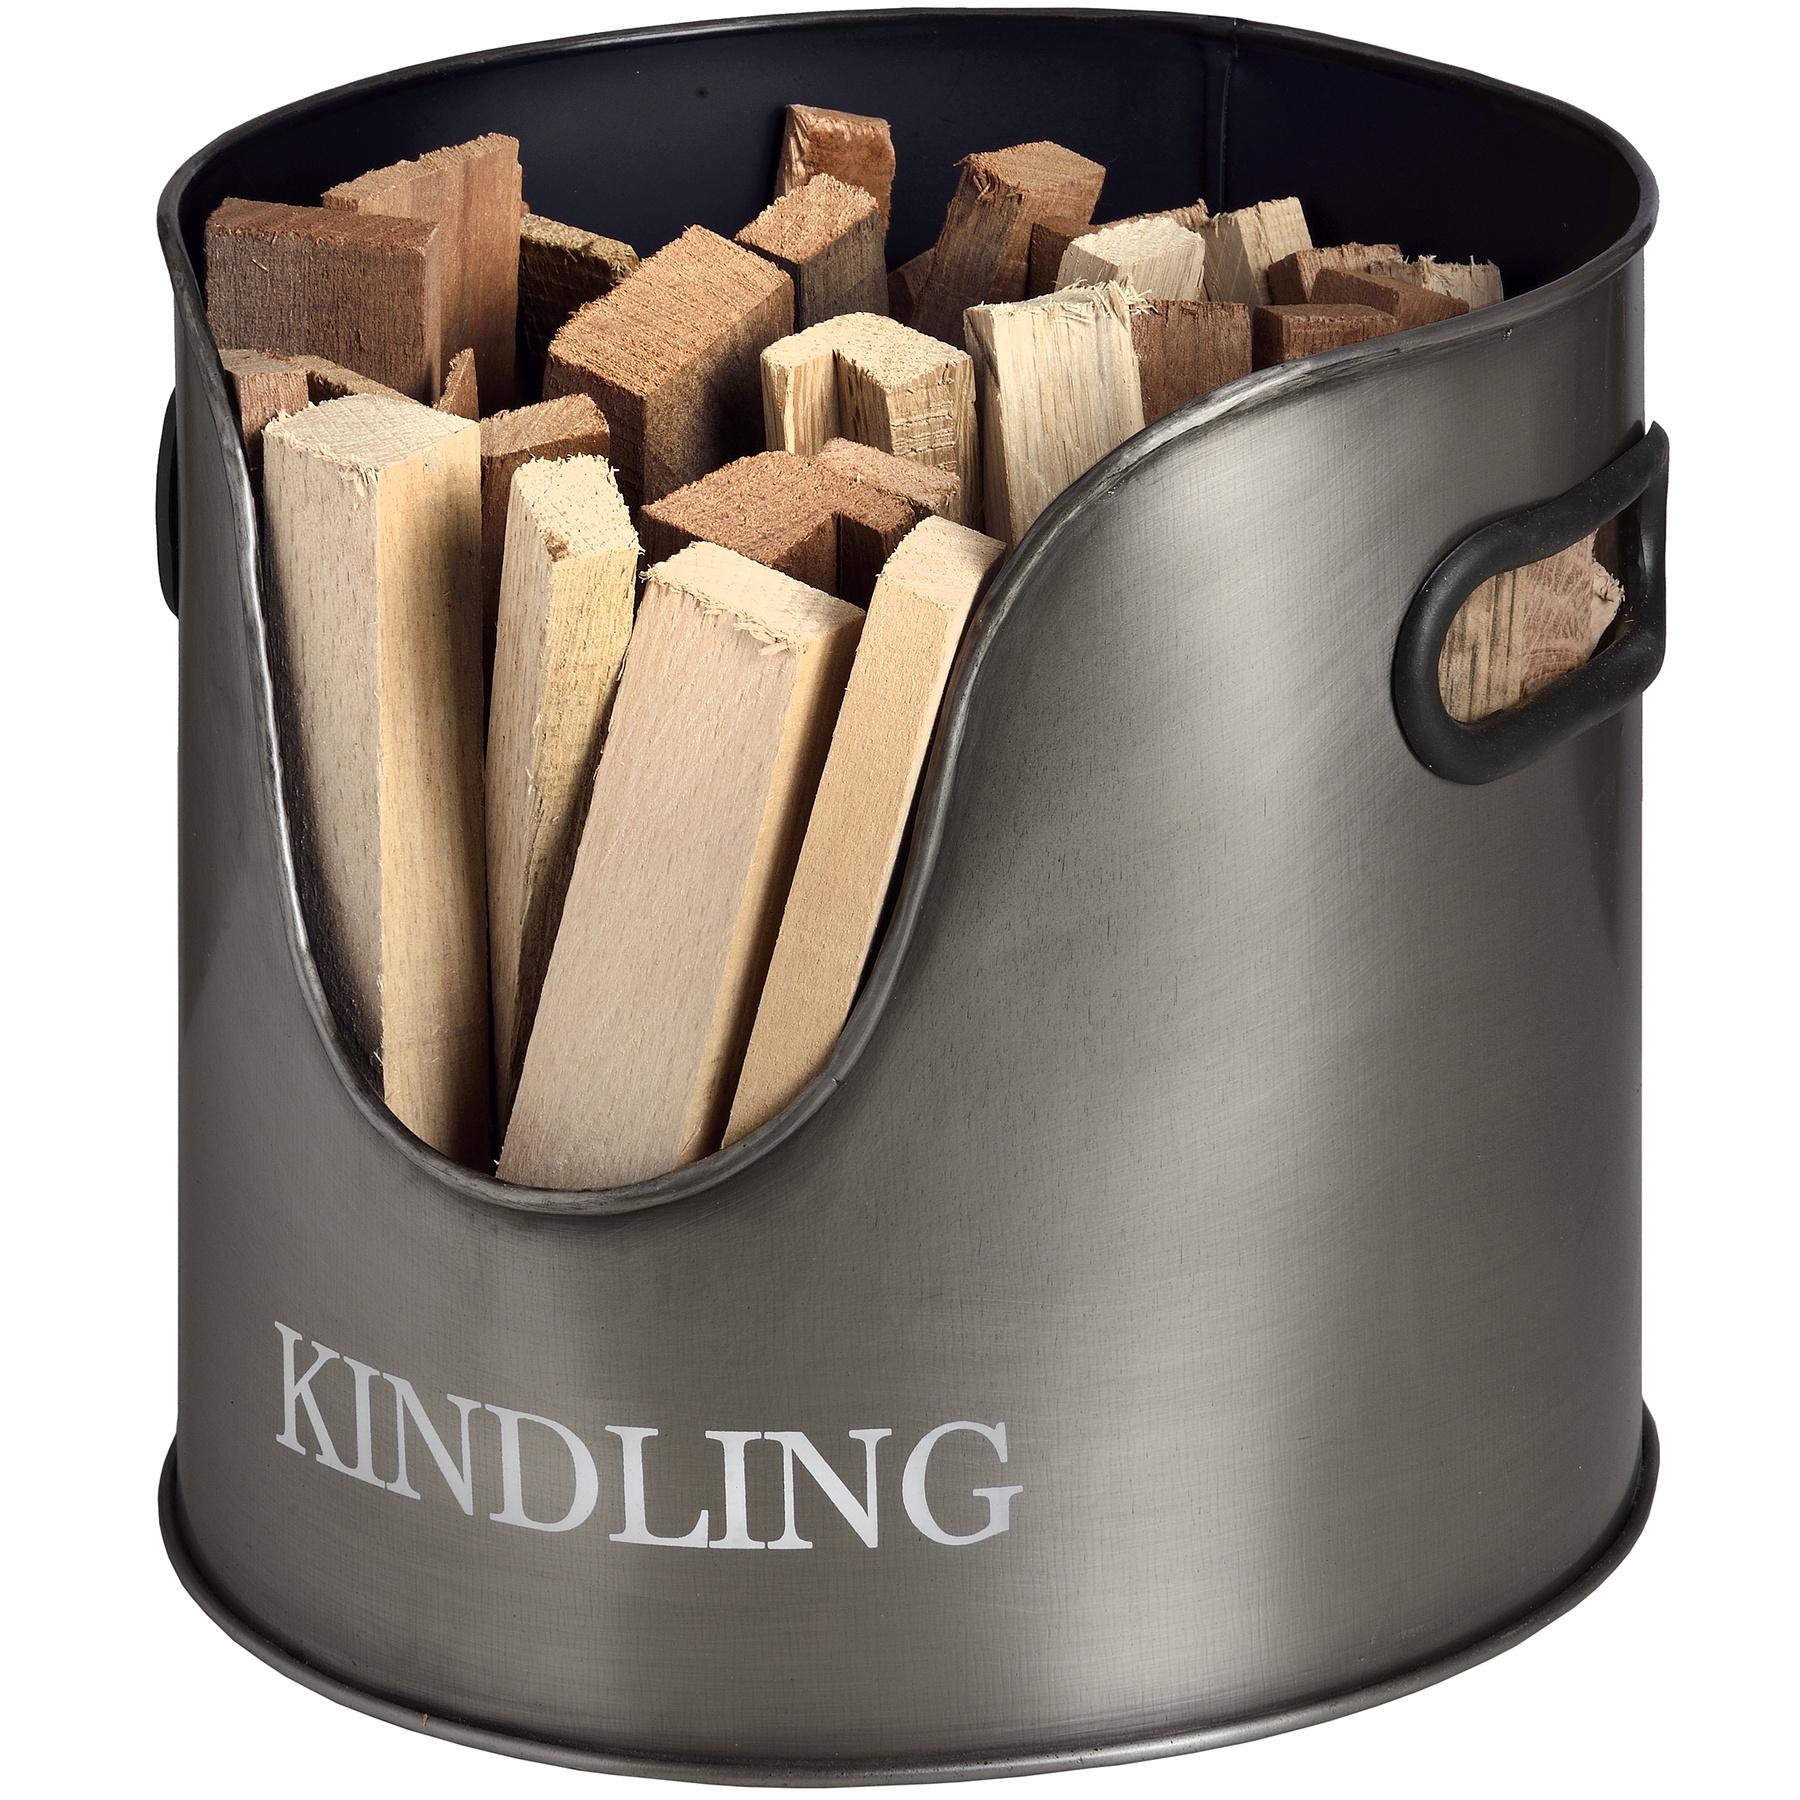 Set of Log and Kindling Holders Fireside Accessories Log Bucket Kindling Bucket